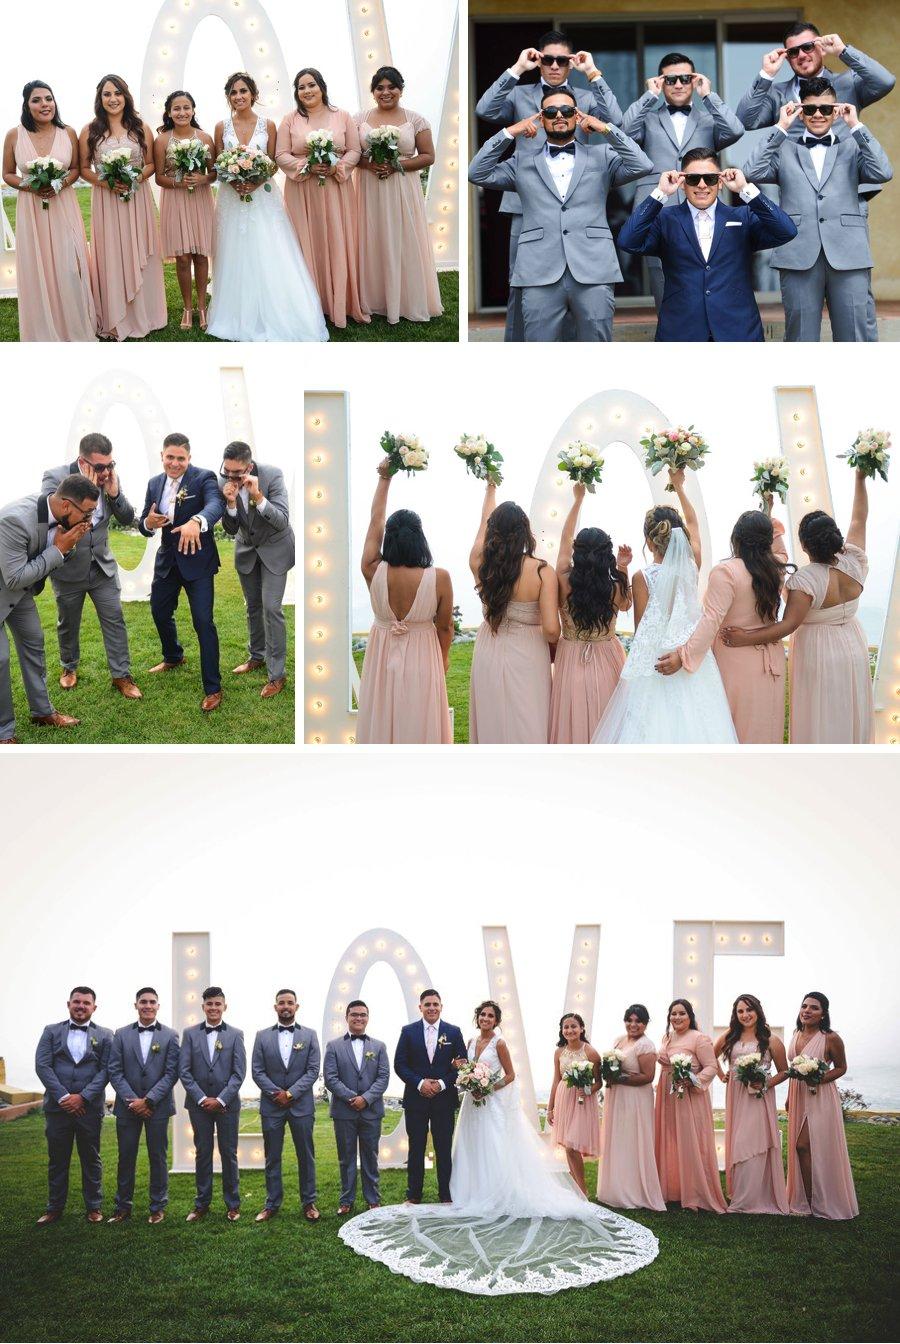 Real wedding: Roses in Rosarito Mexico